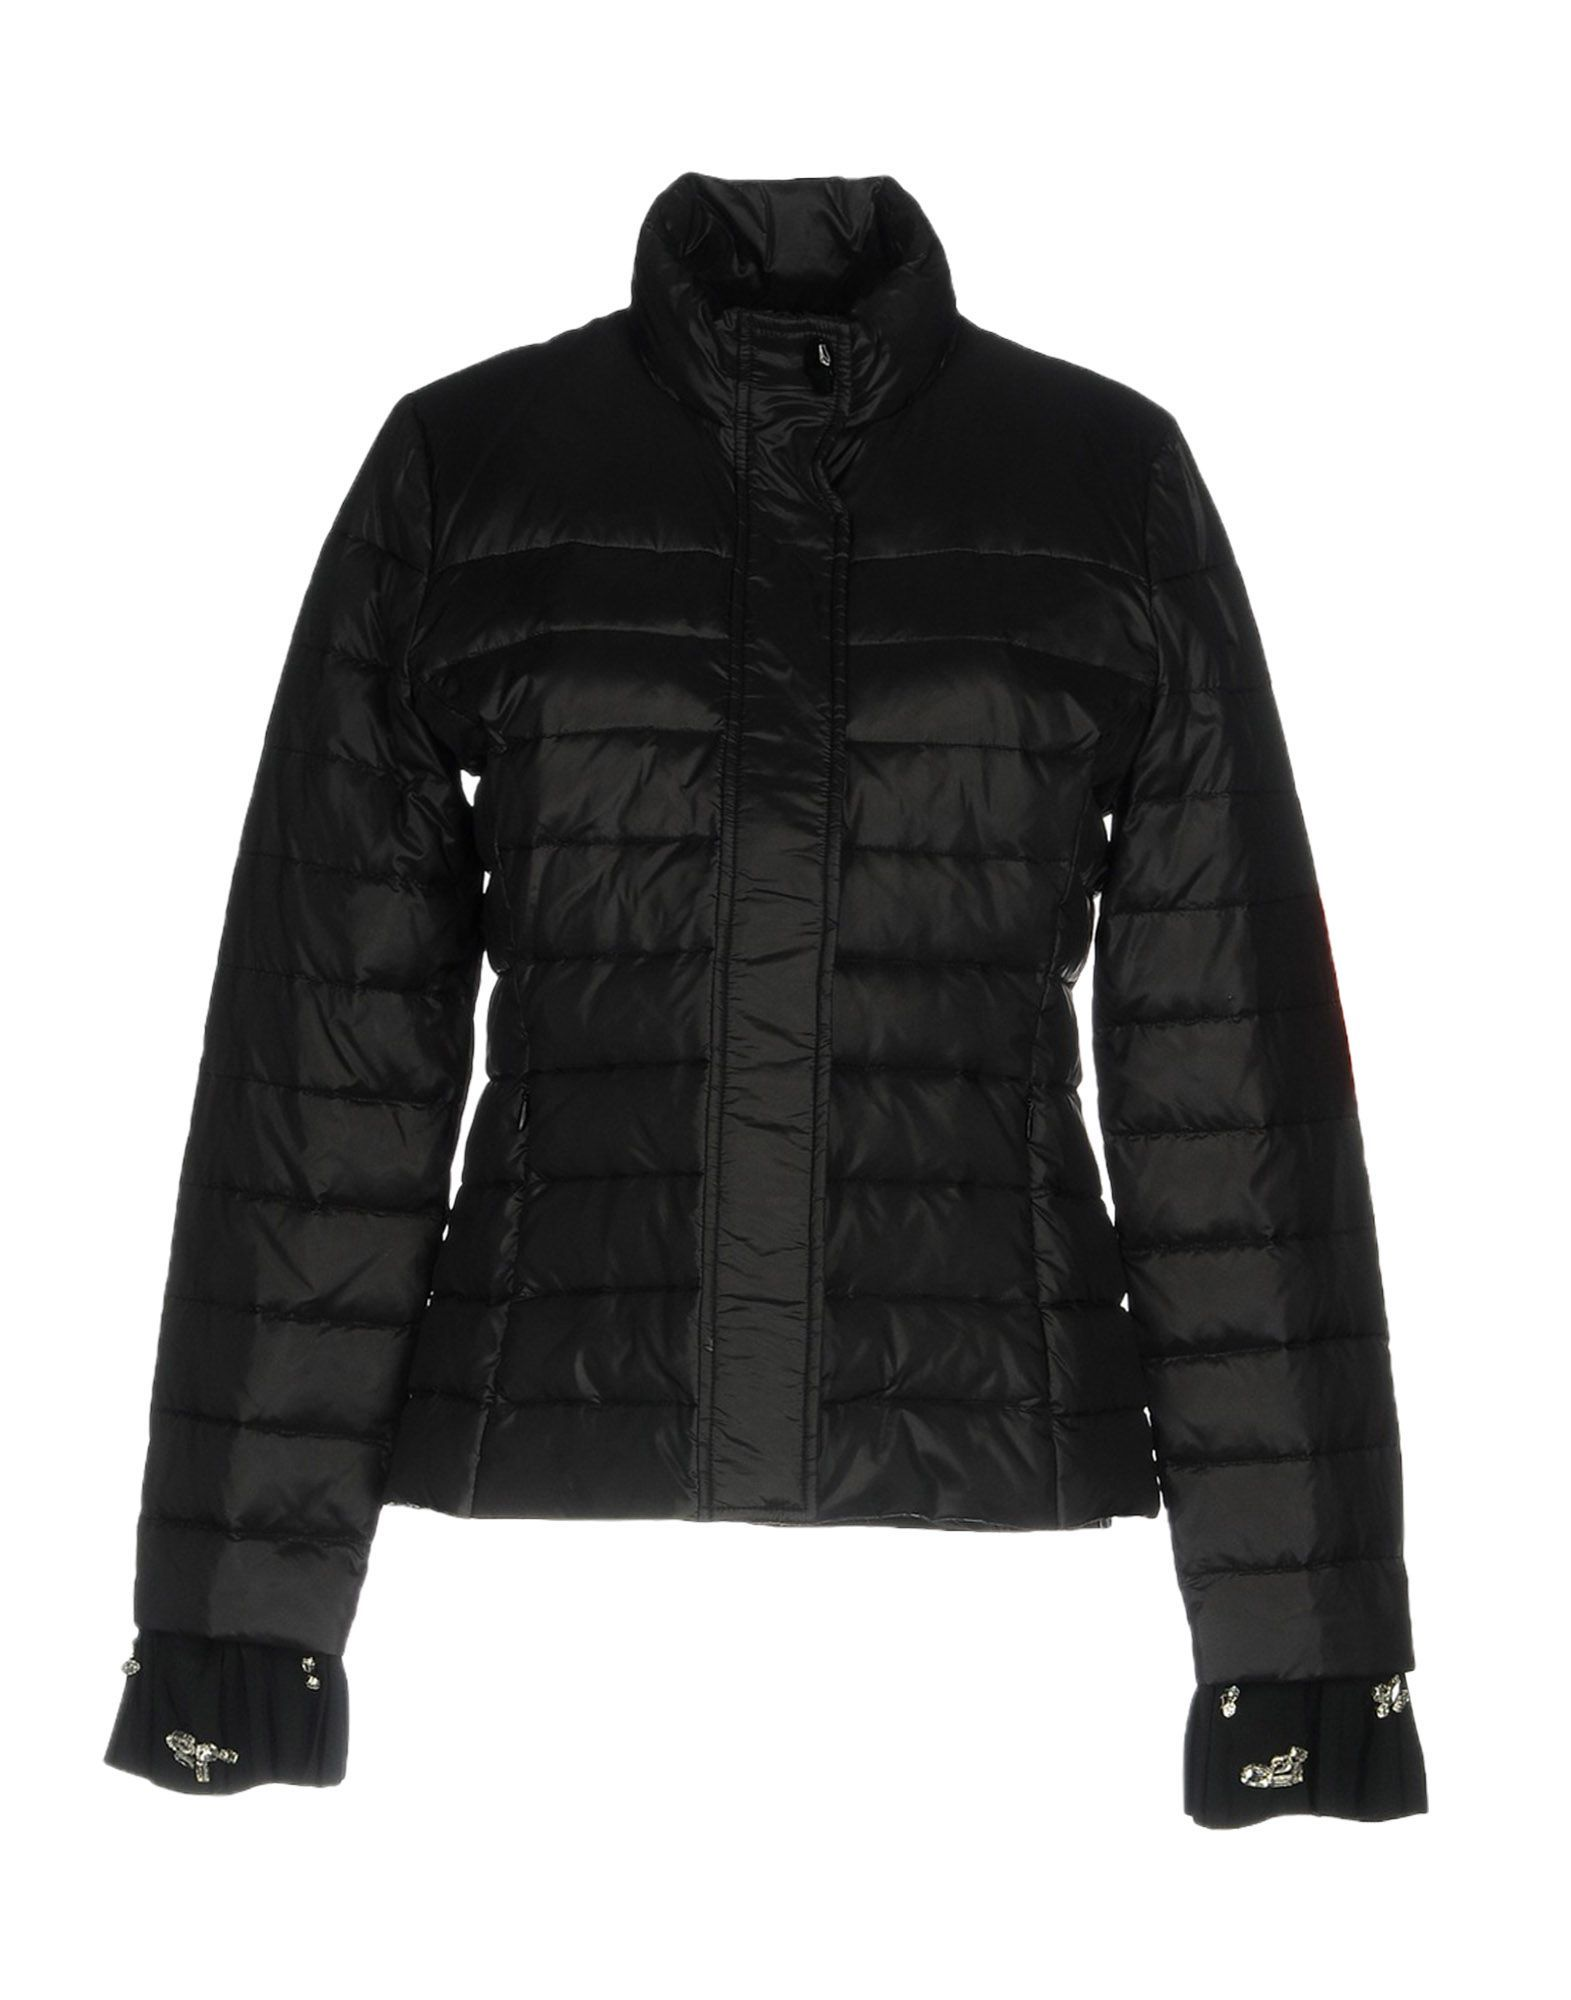 Cavalli Class Black Techno Fabric Padded Jacket